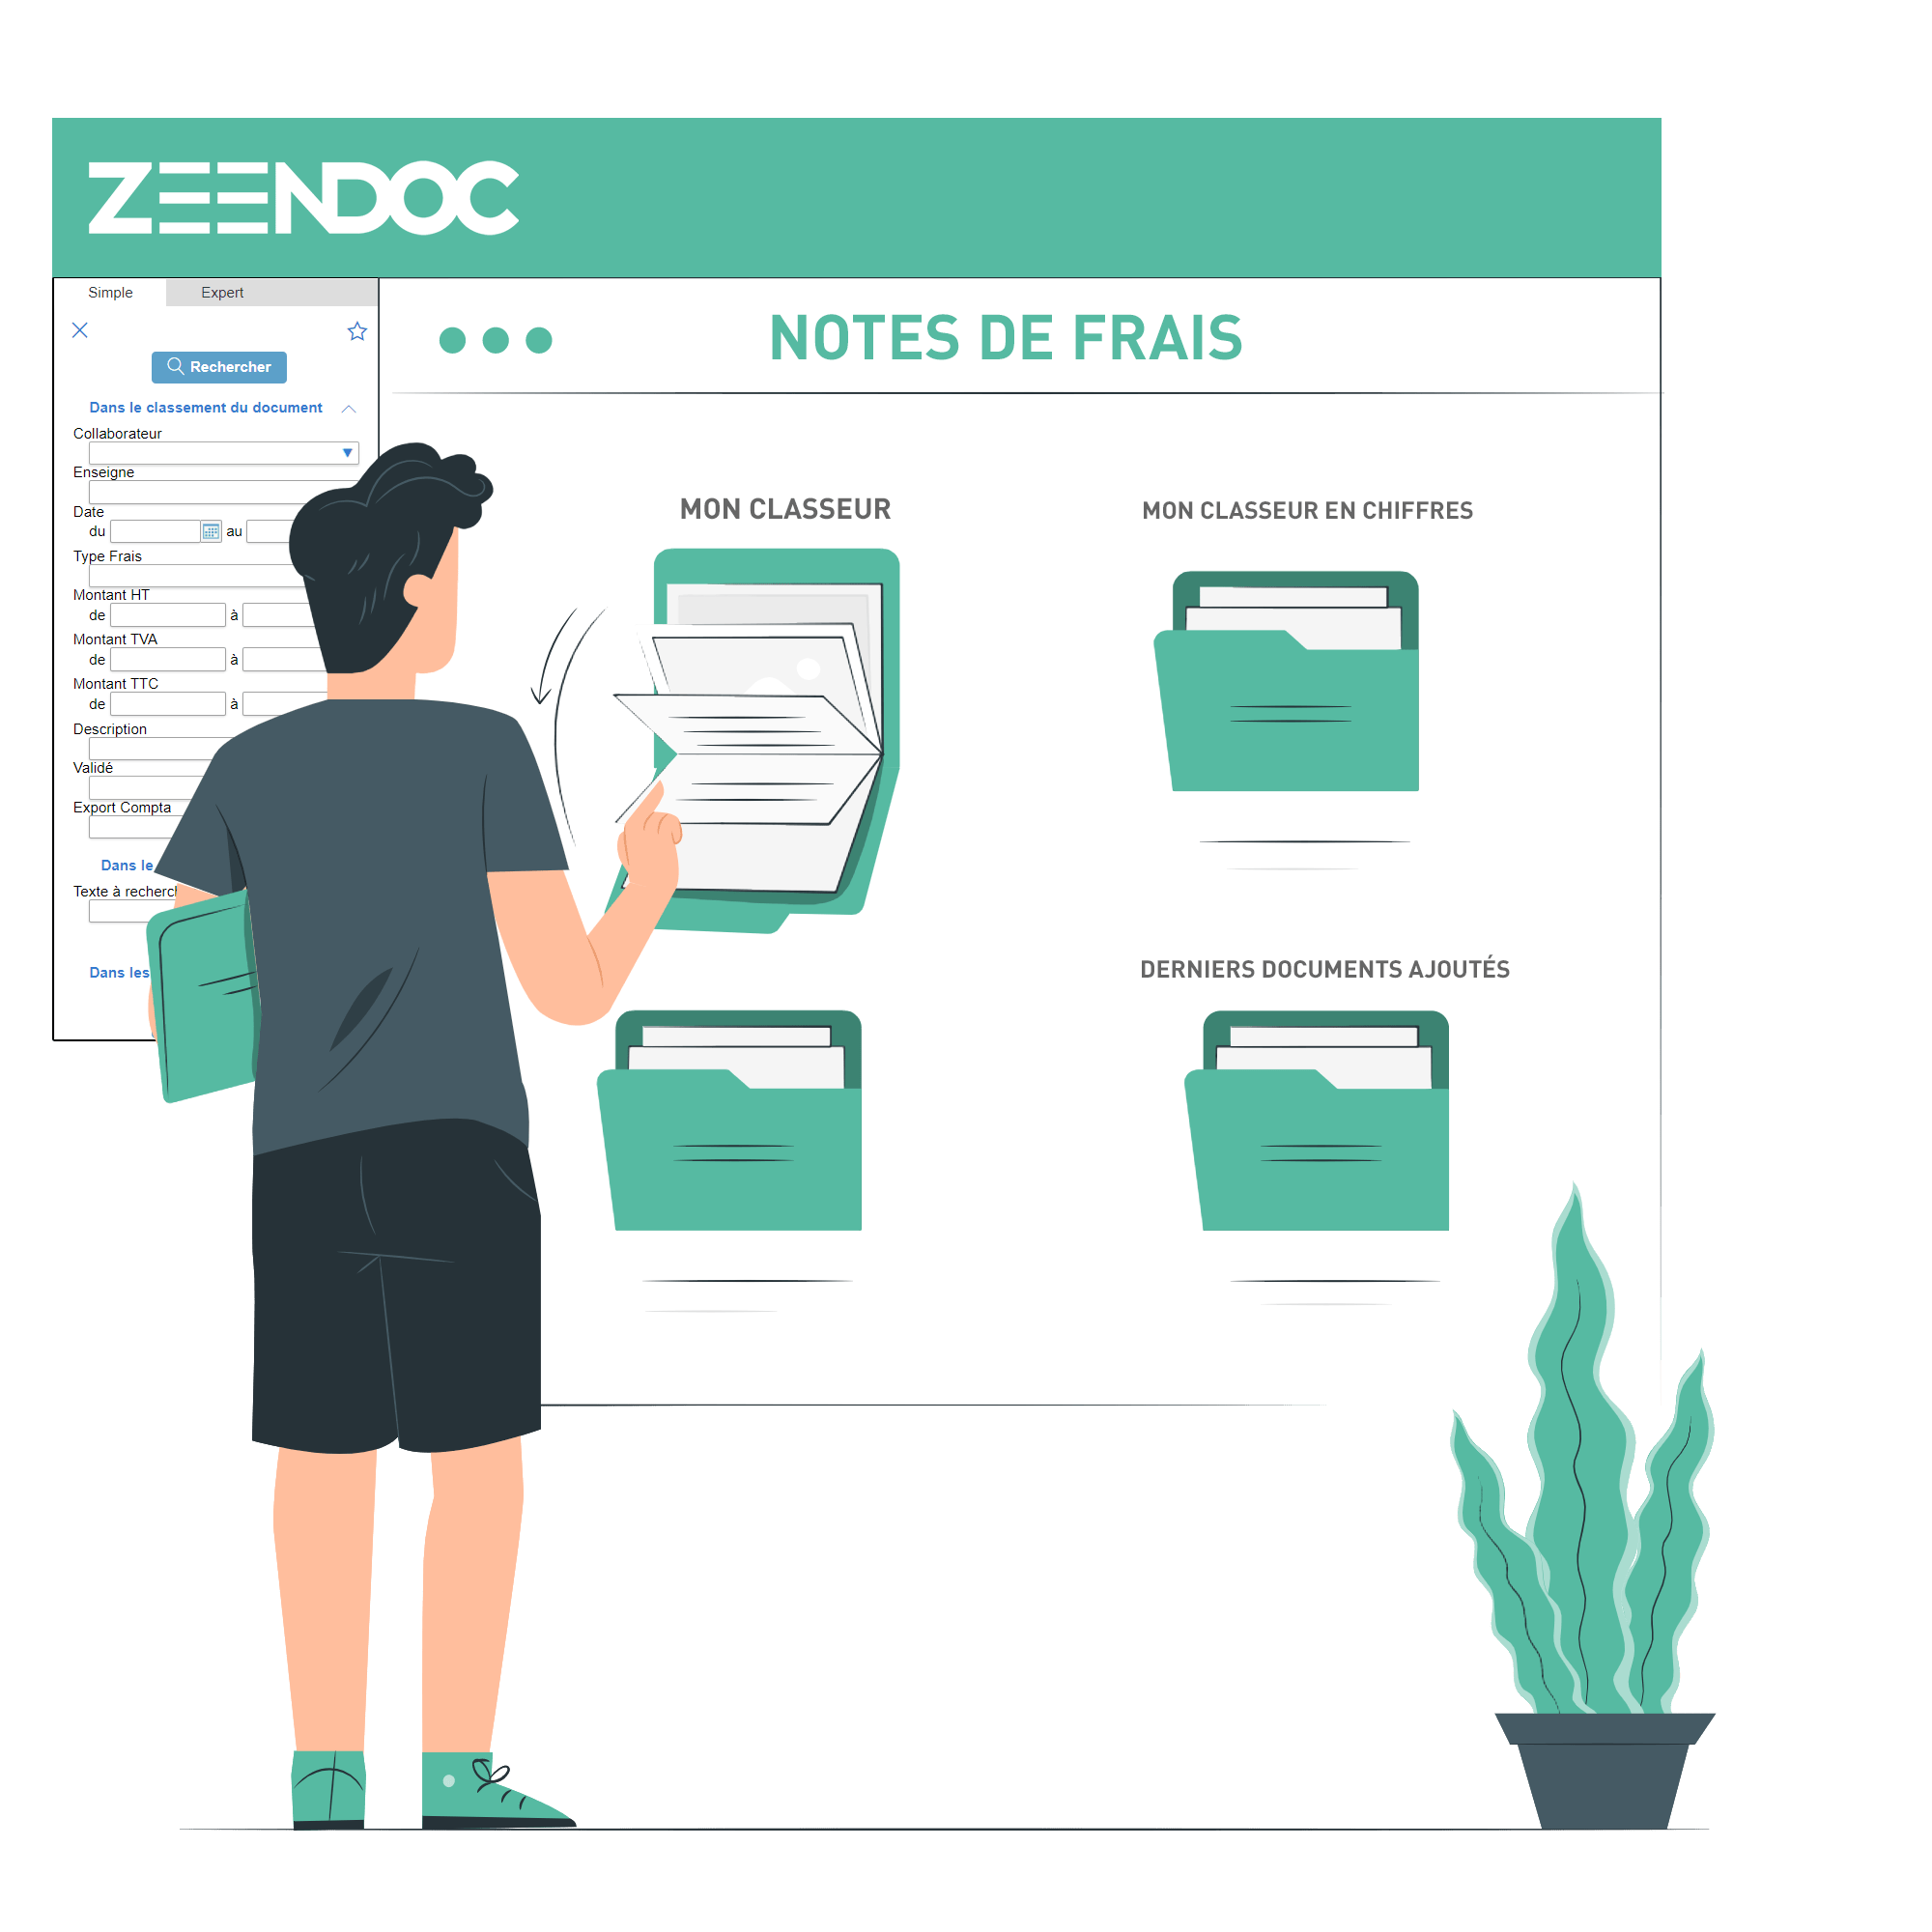 application-notes-de-frais-zeendoc